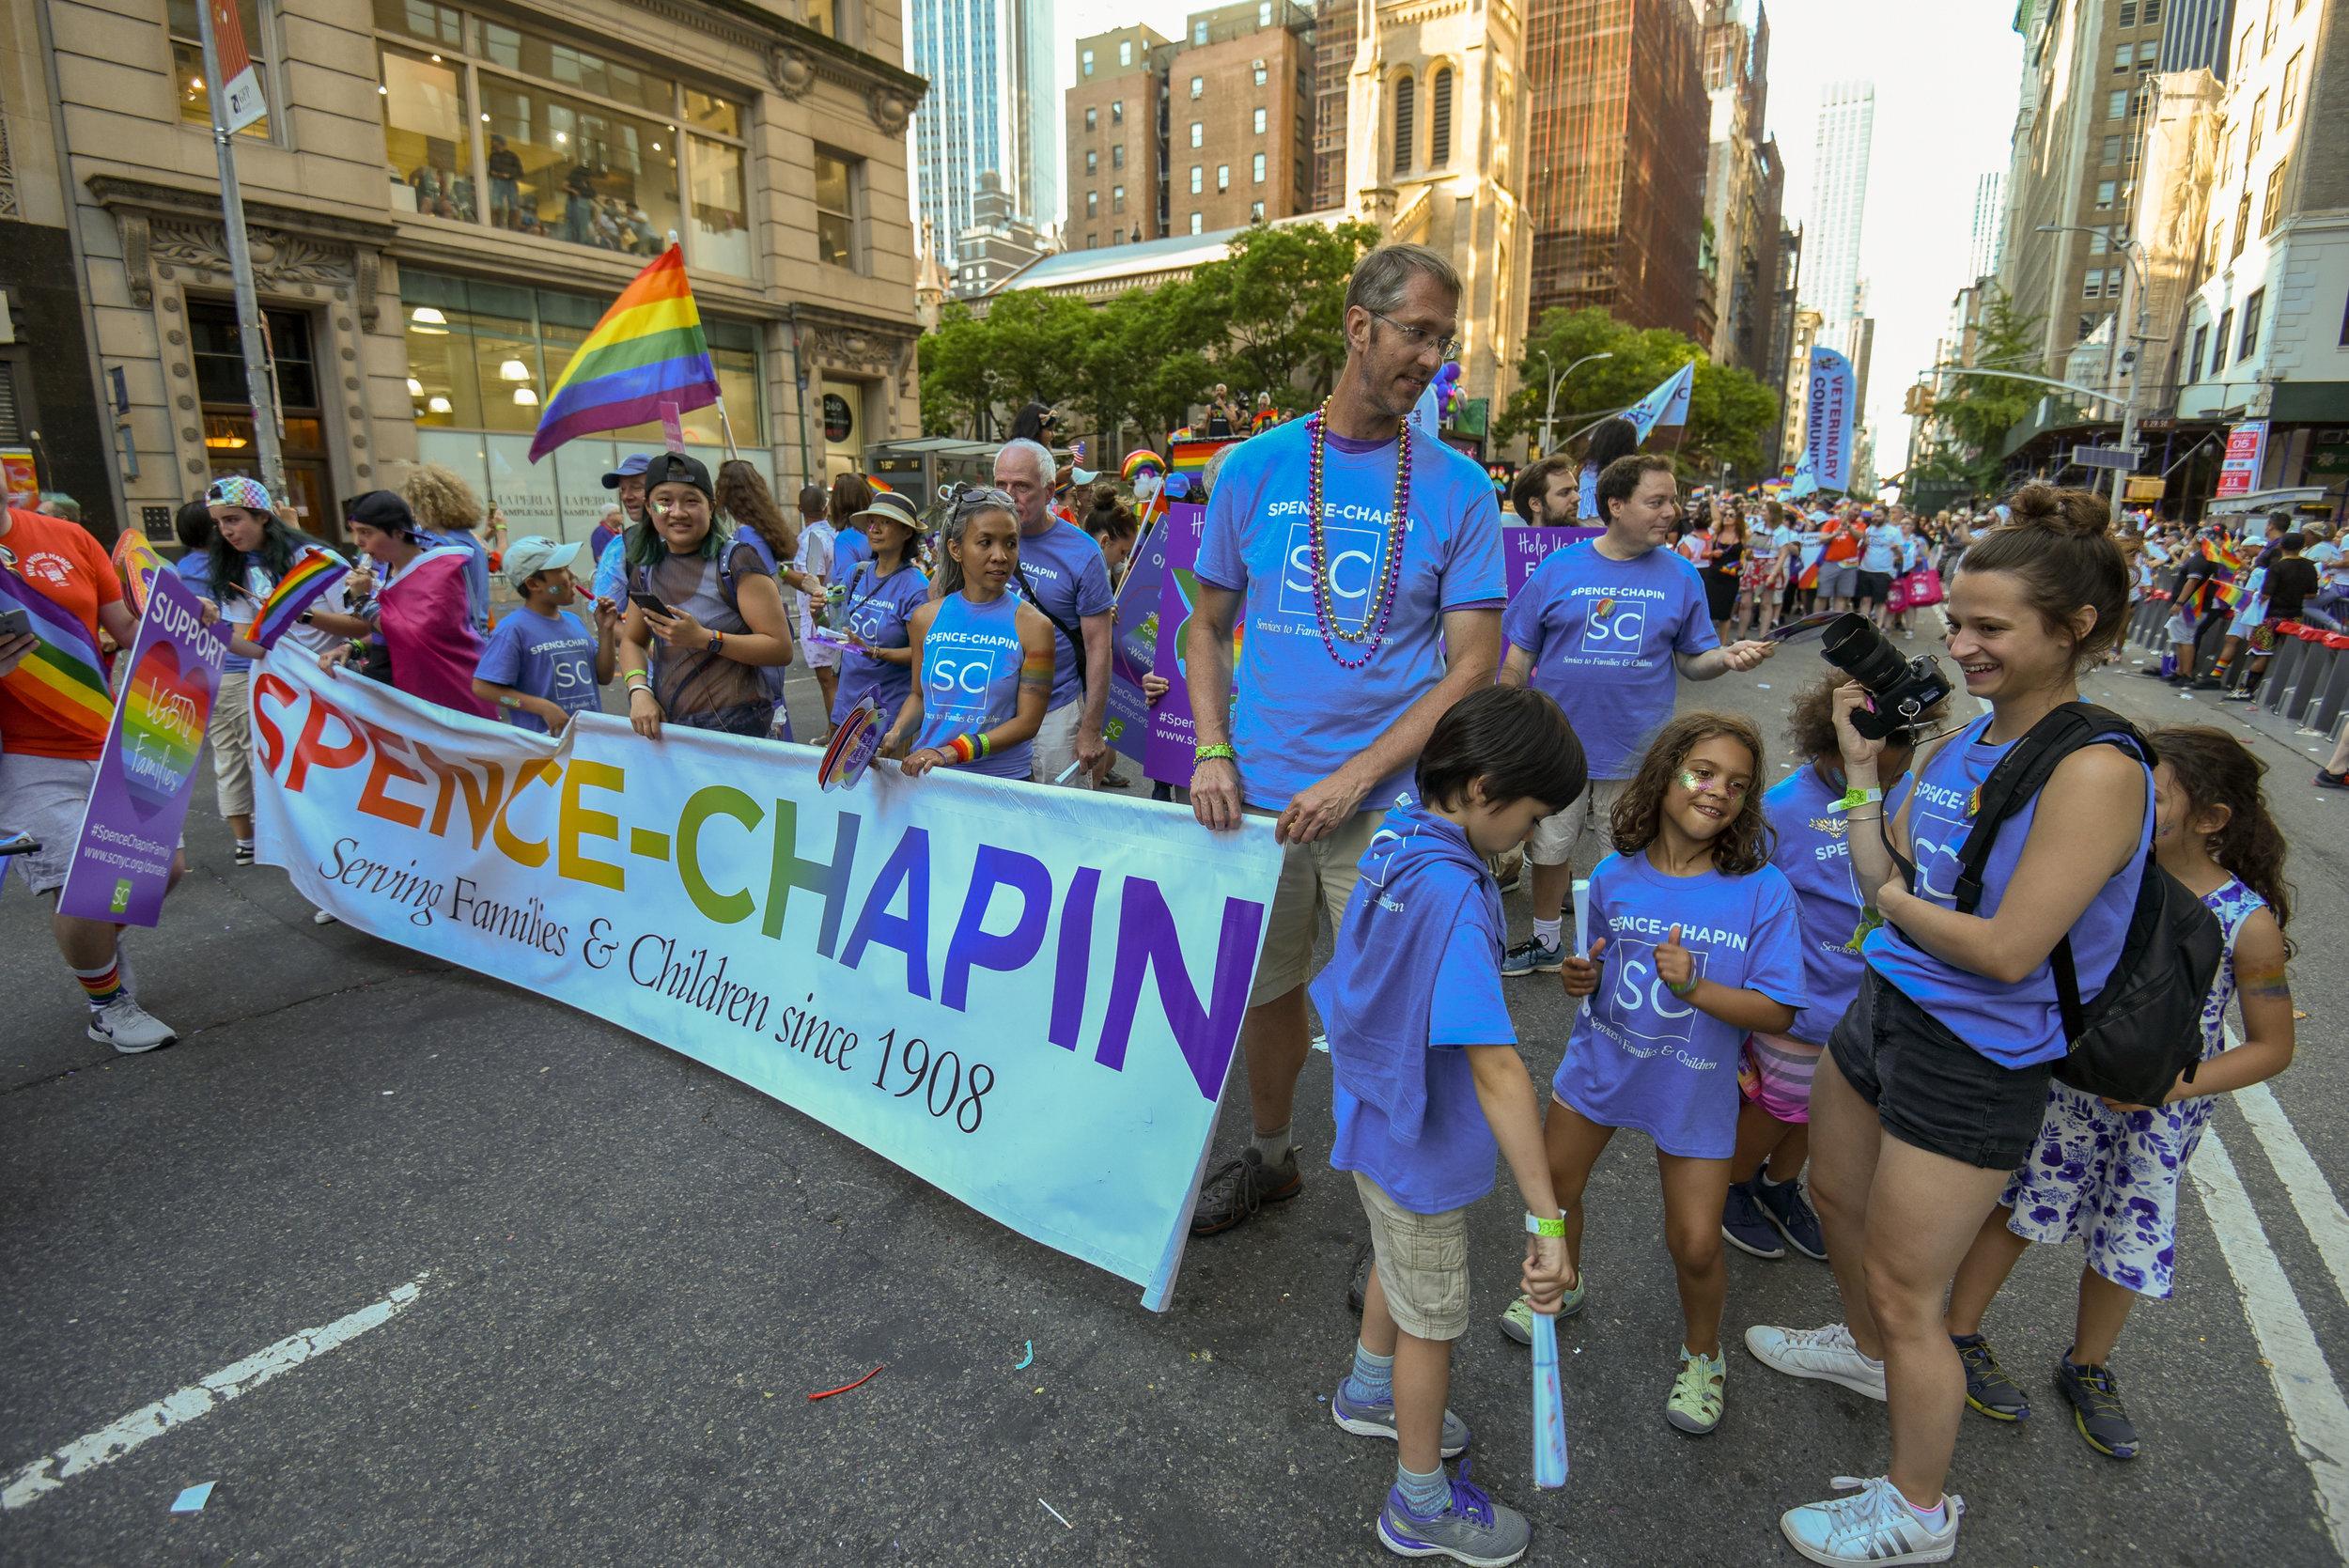 SC-PrideParade-2019_FE-292.jpg